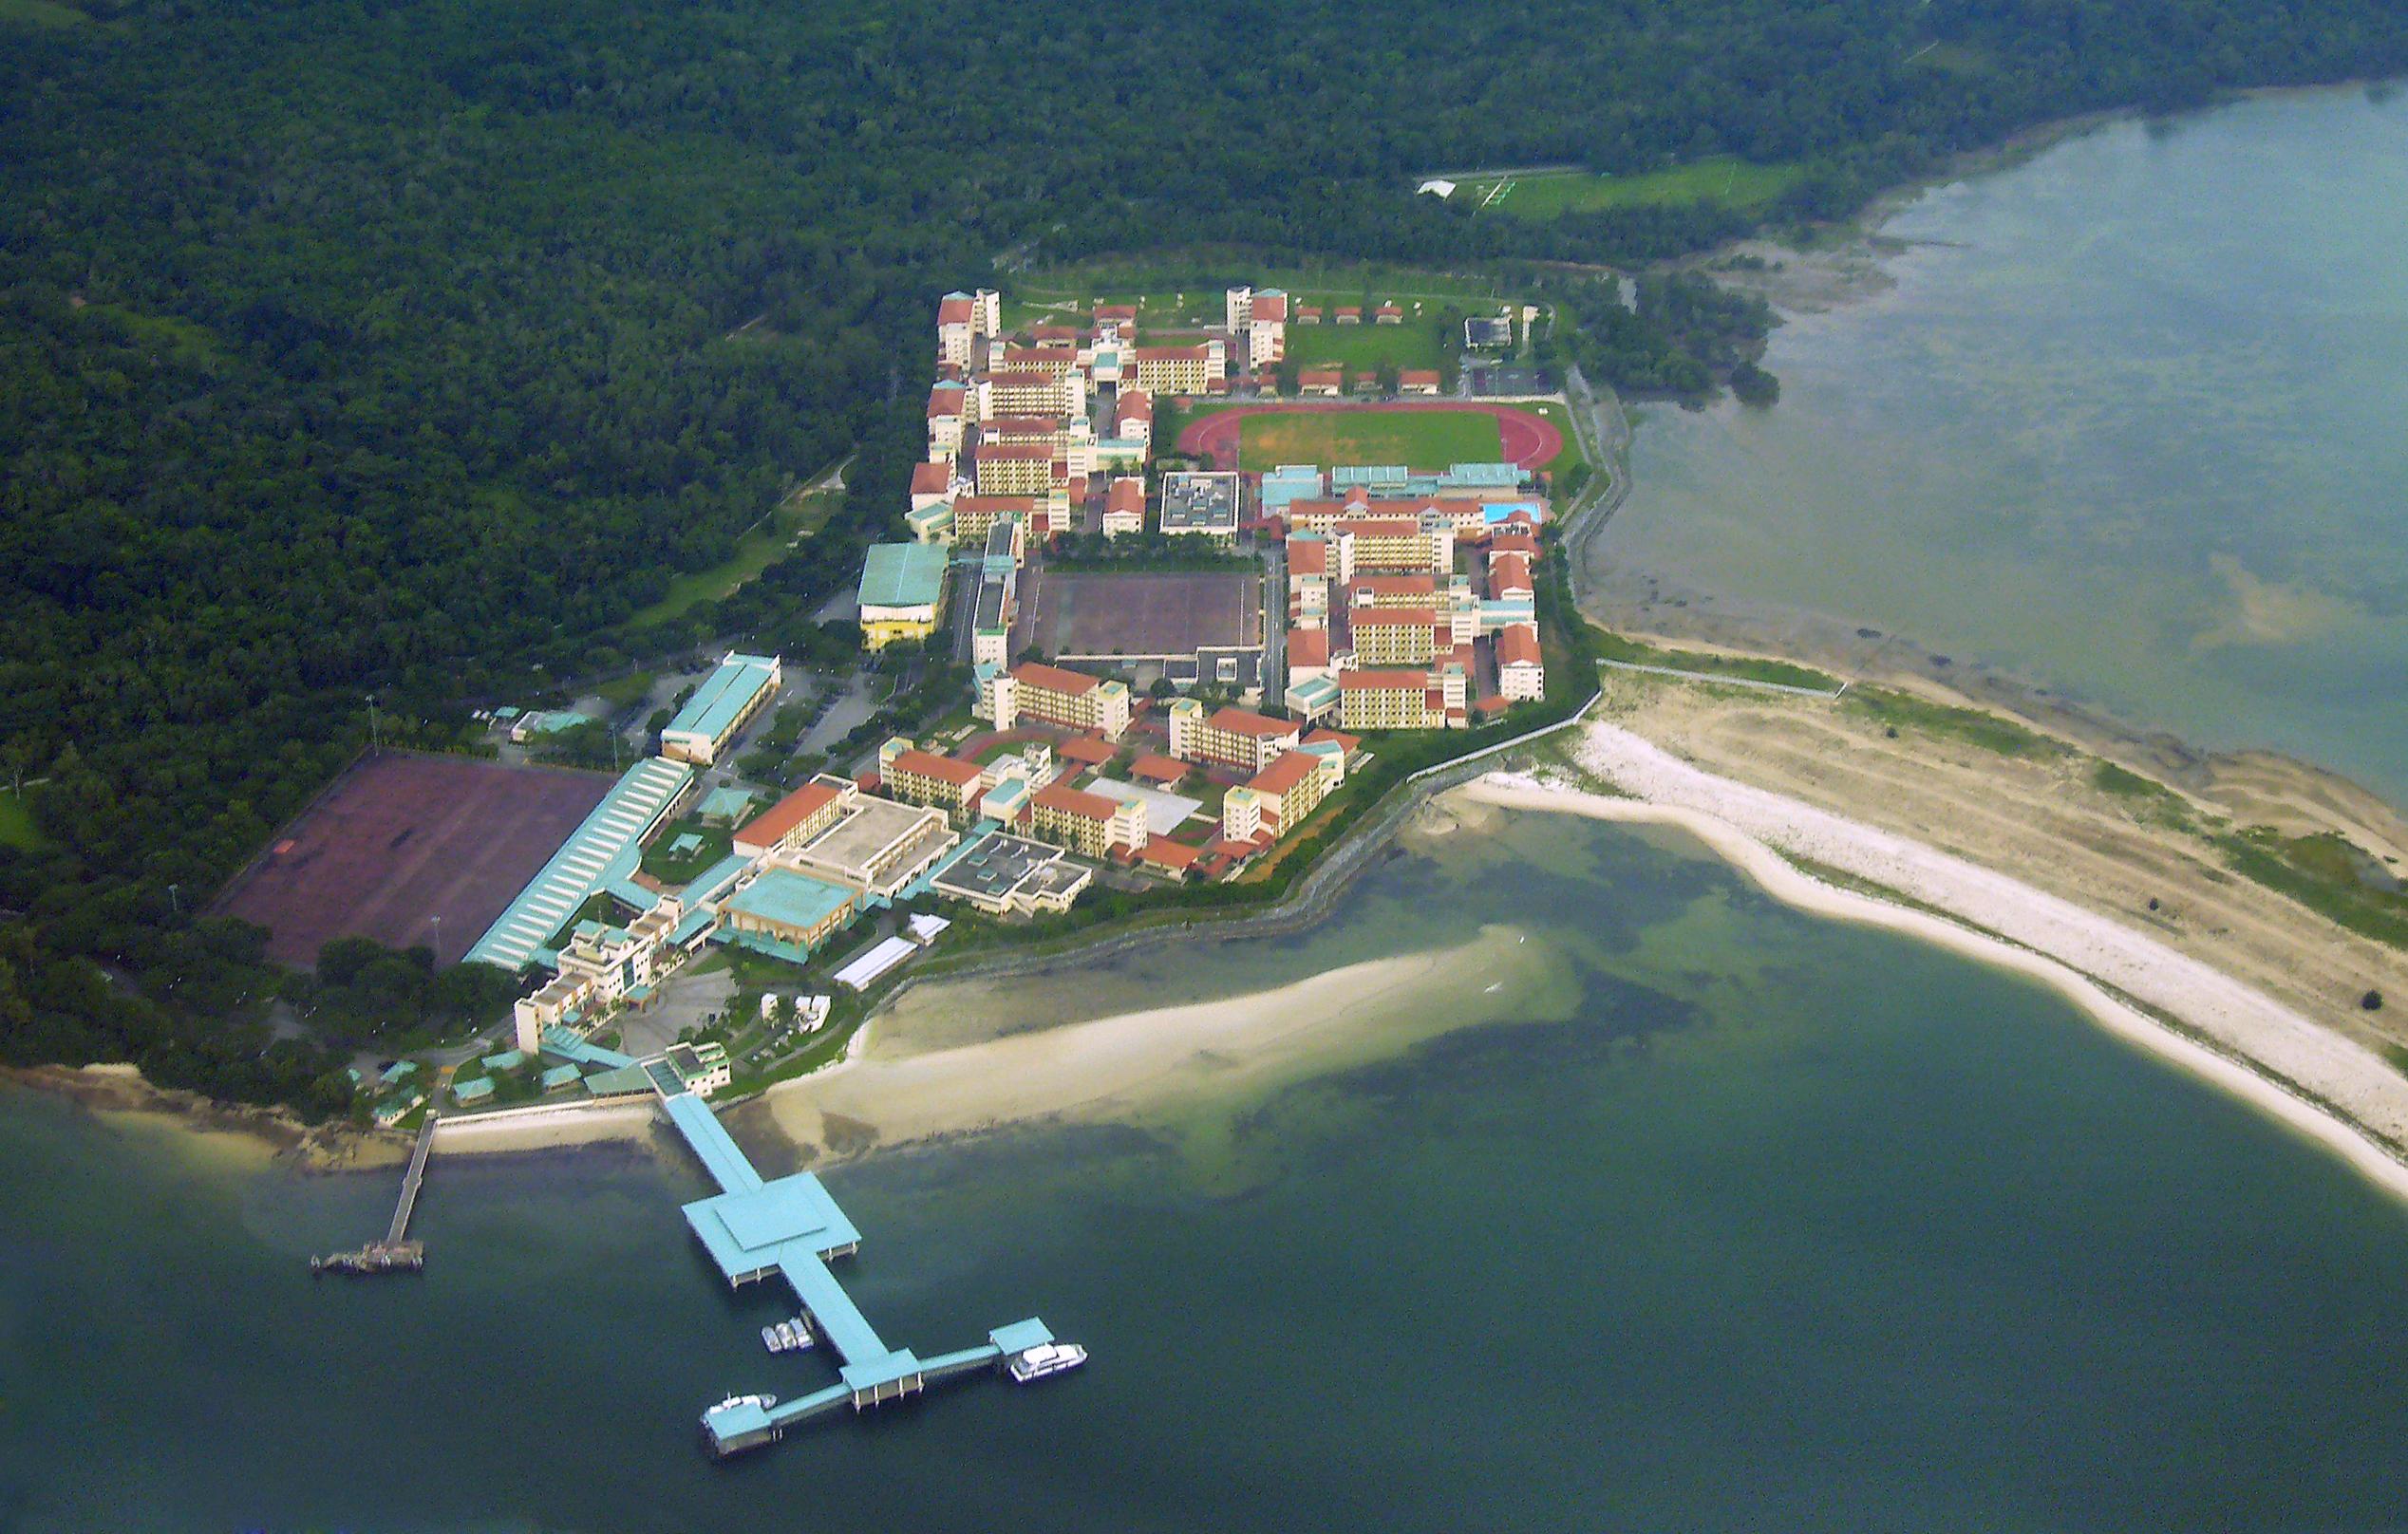 Pulau Tekong - Wikipedia